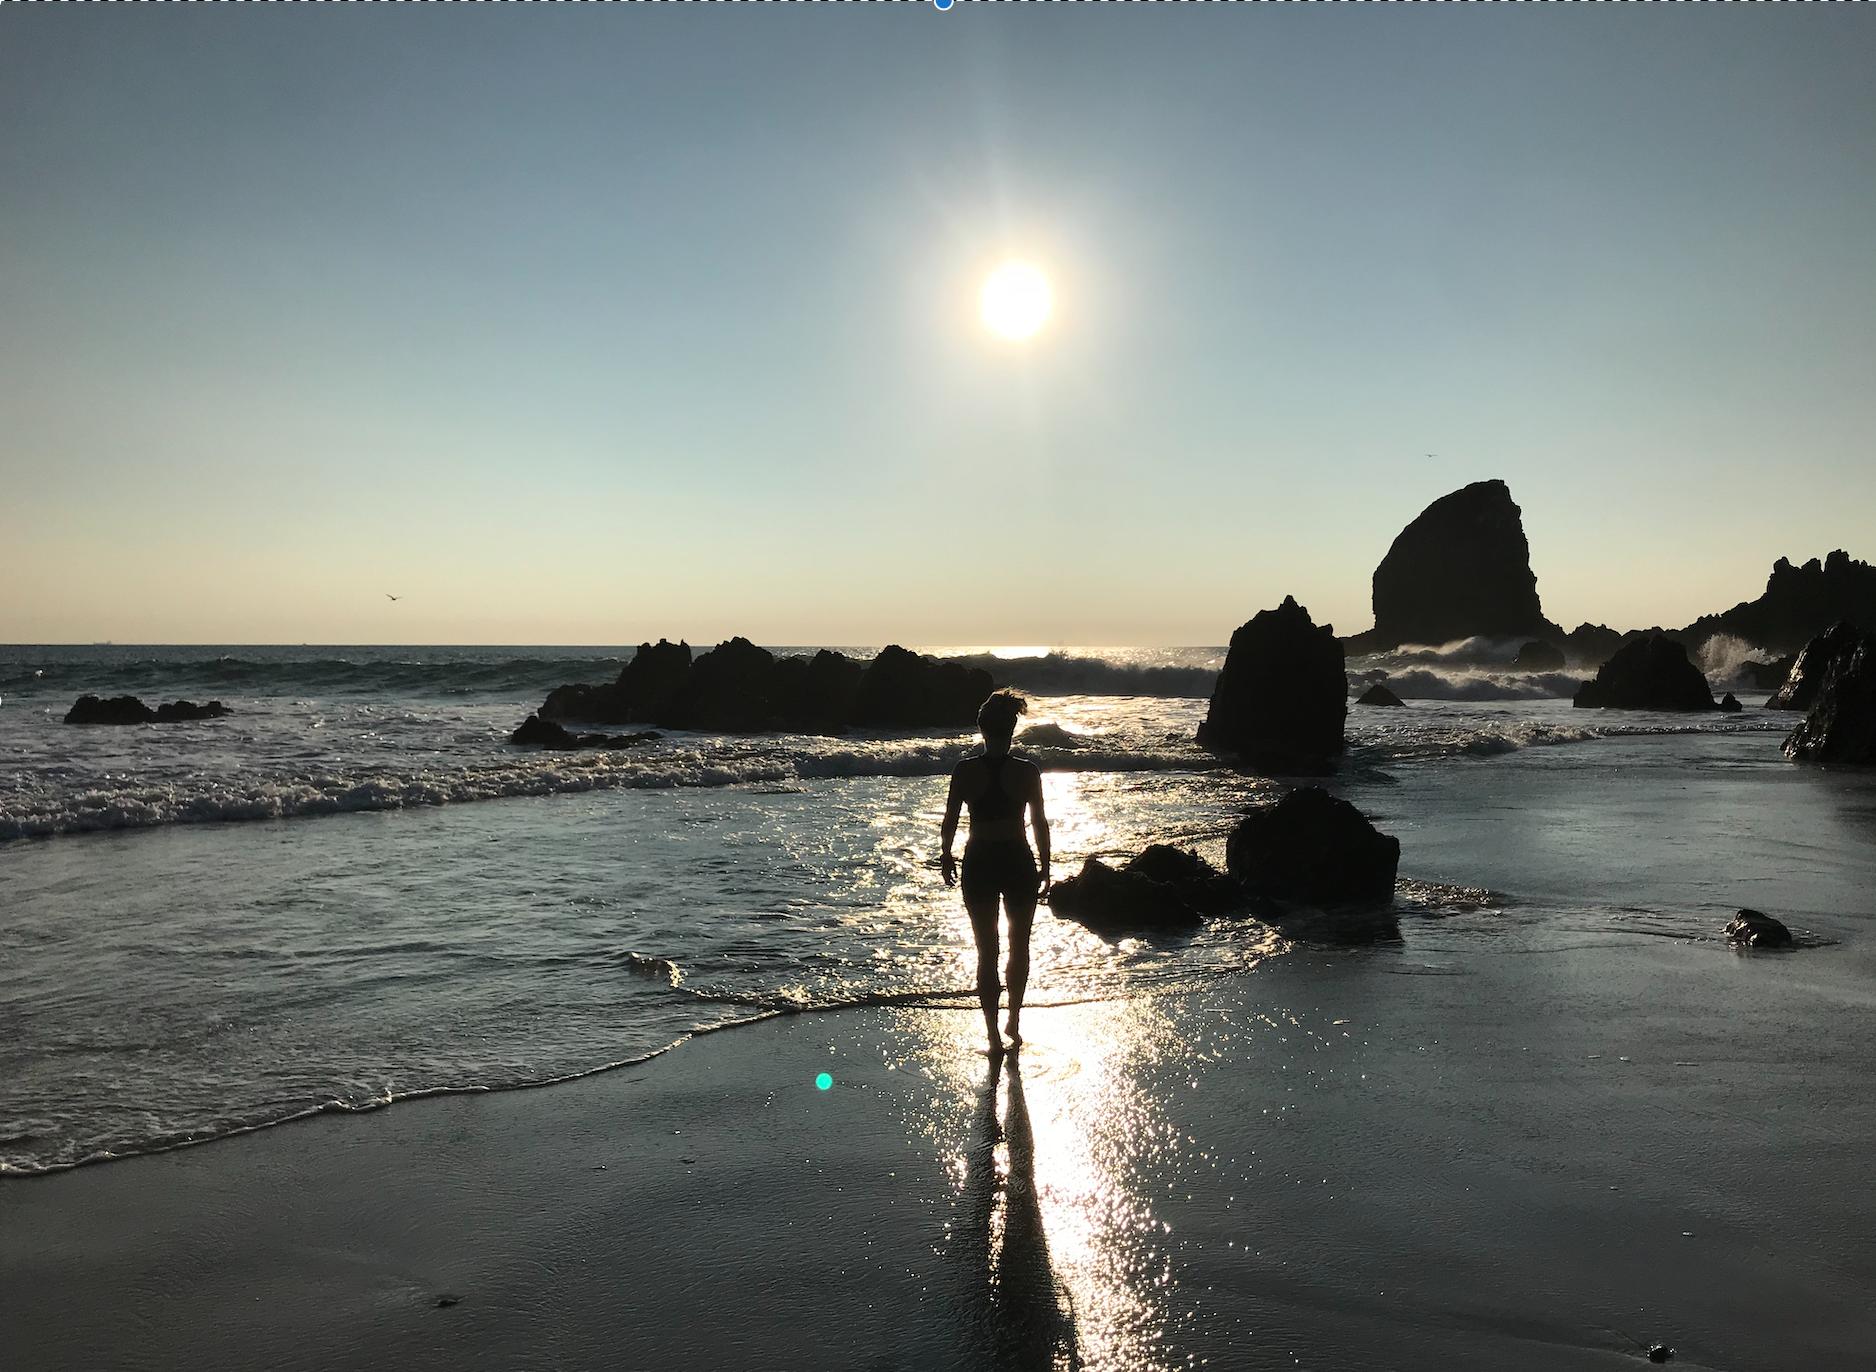 Playa Azul: Empty beaches & morning beach runs